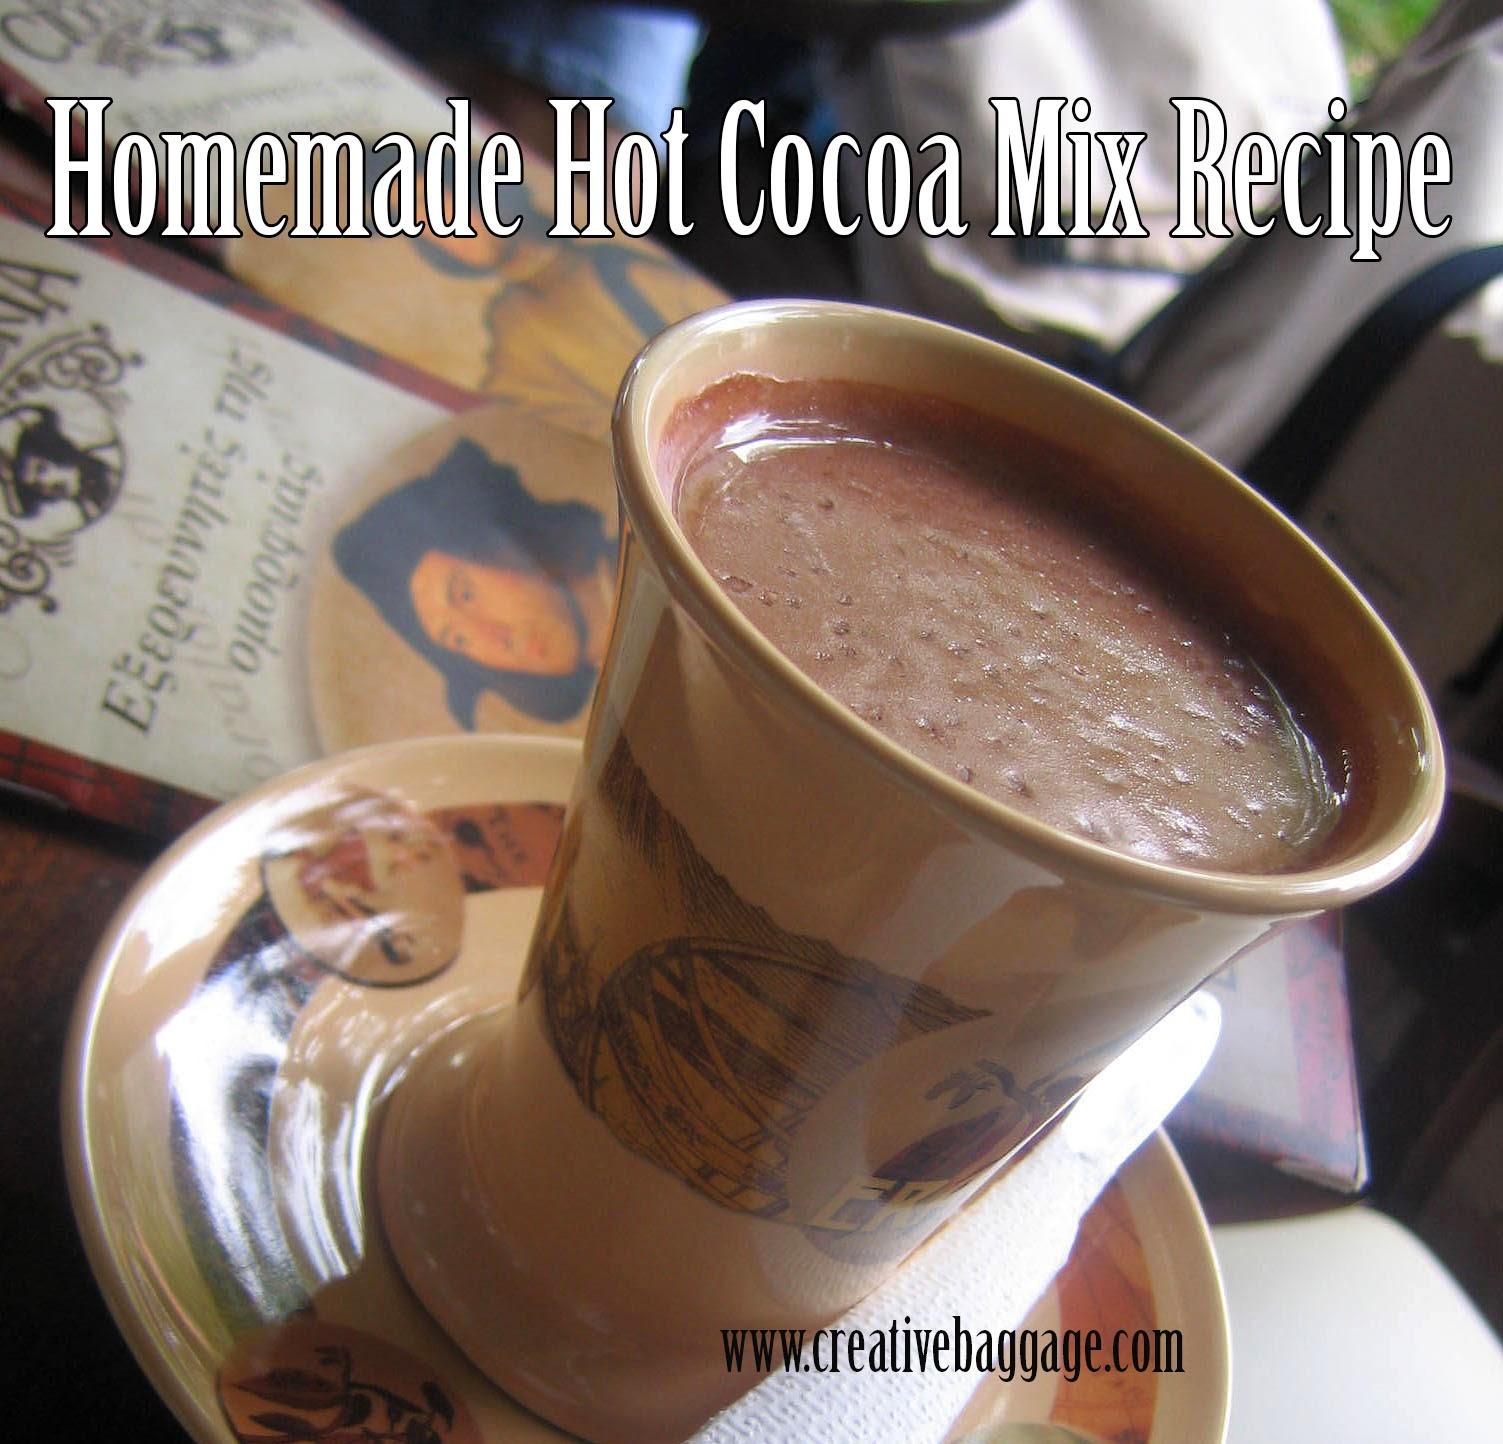 Homemade Hot Cocoa Mix Recipe Image